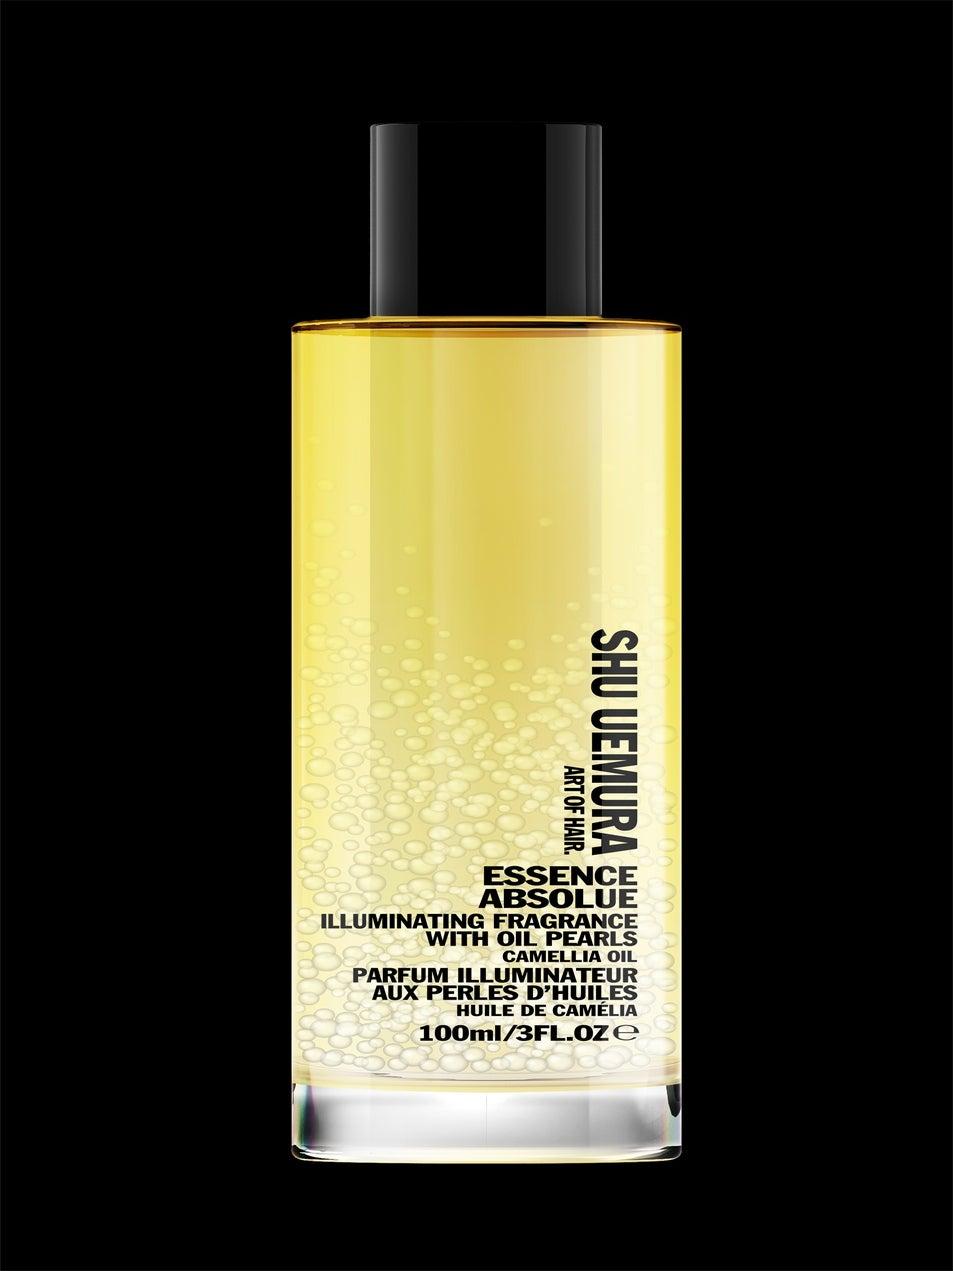 Review: Shu Uemura Essence Absolue Nourishing Hair Fragrance